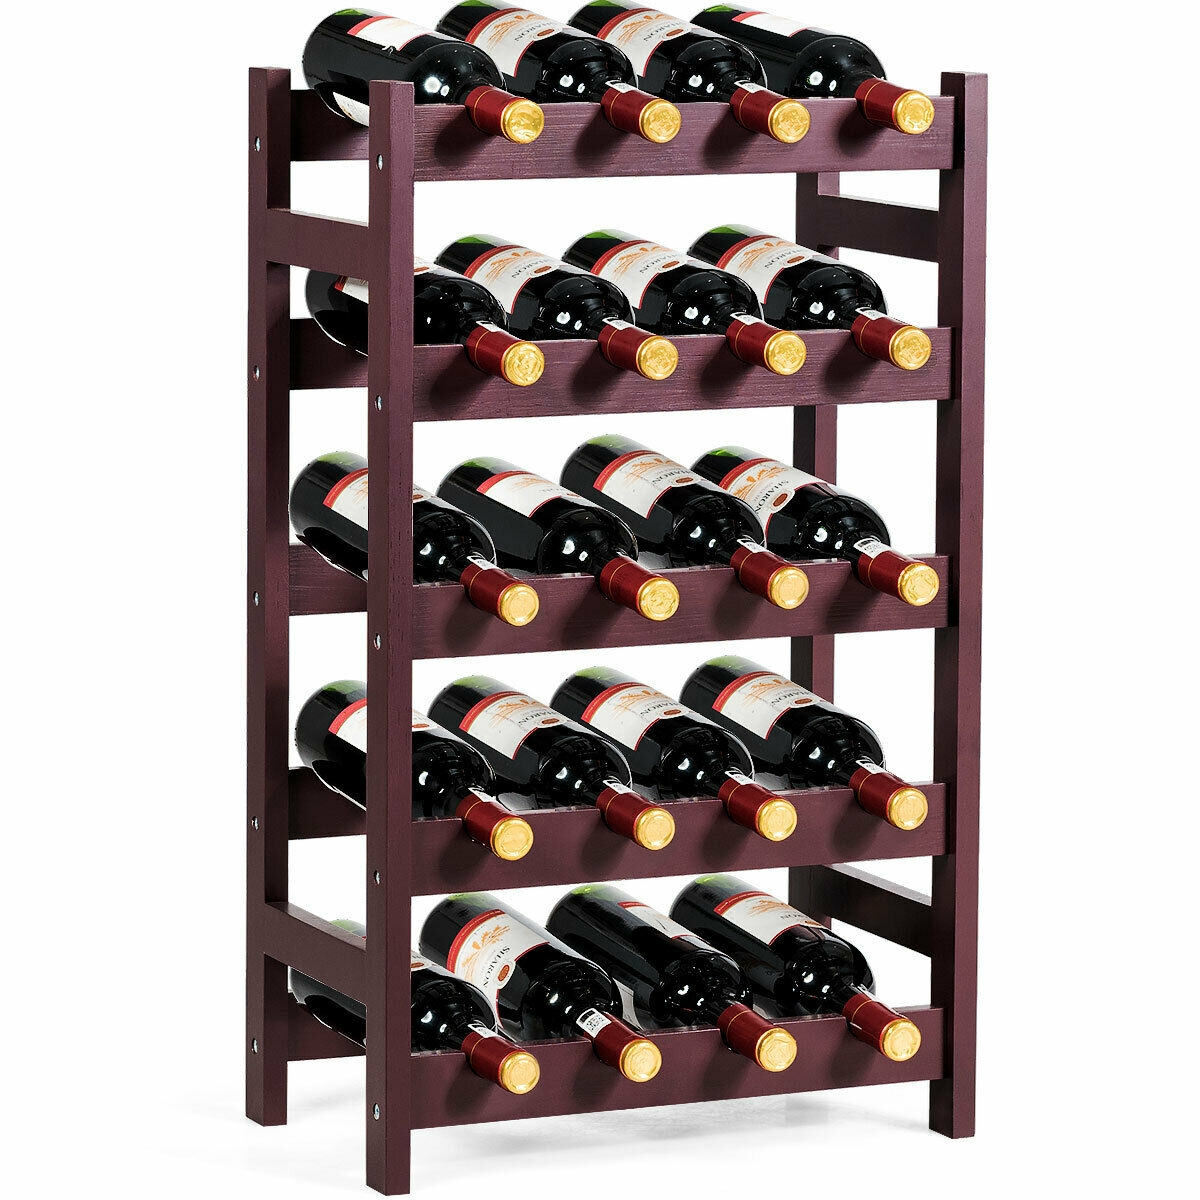 Wood Wine Rack 5-Tier Bottle Display Storage Shelf Free Standing